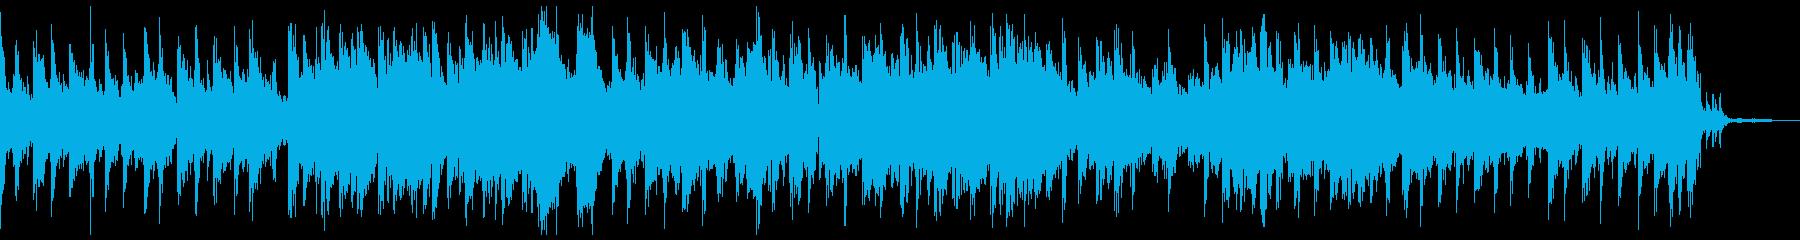 lo-fiな雰囲気のしっとりとしたBGMの再生済みの波形